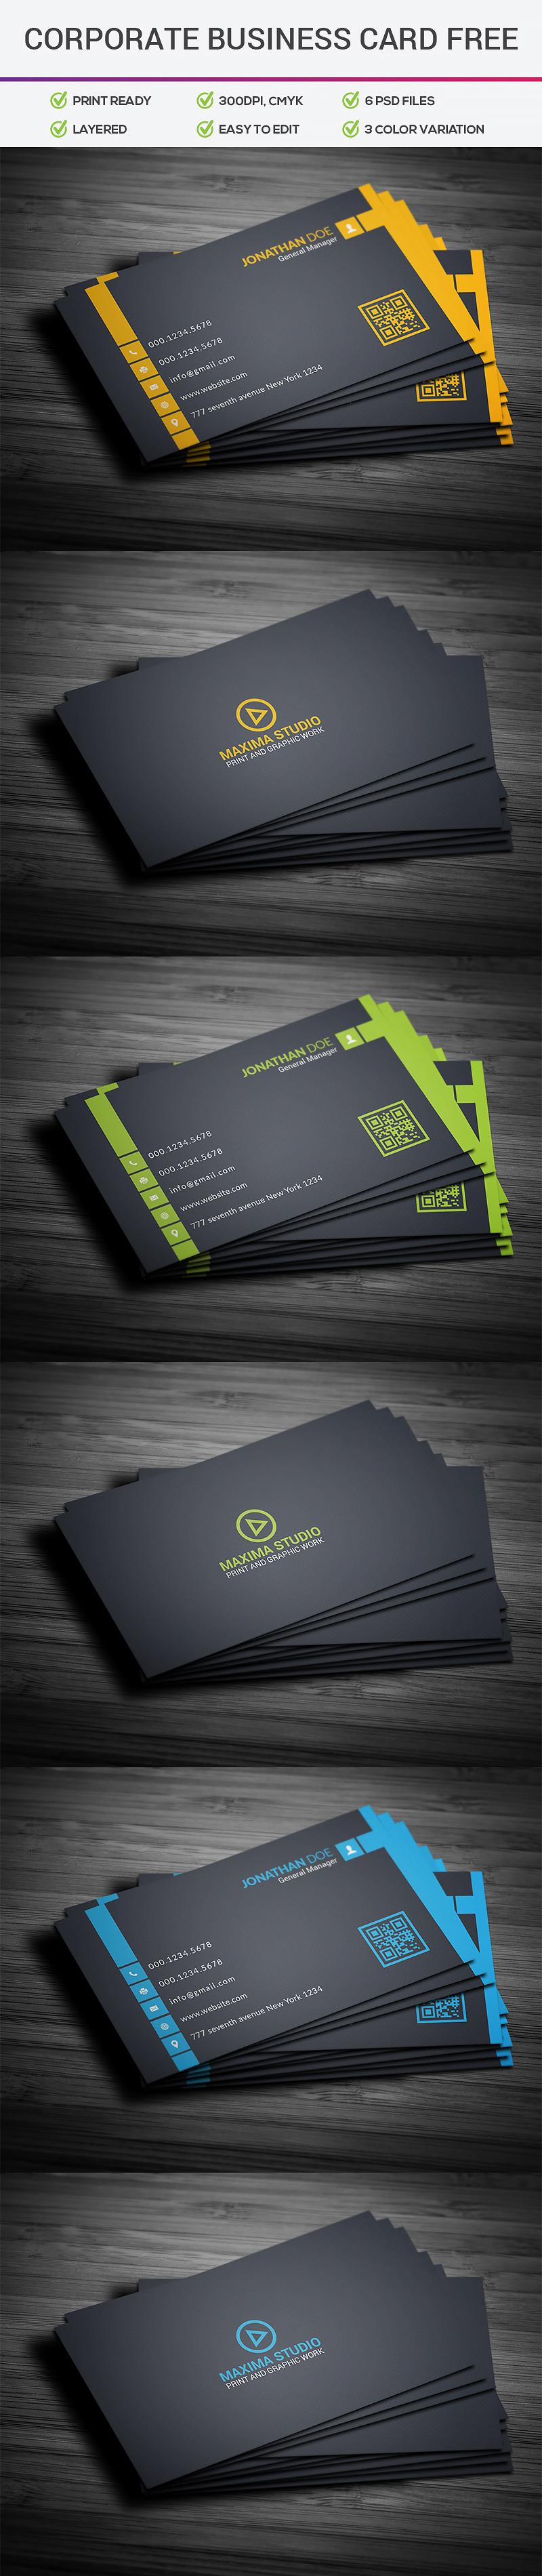 p320 - لایه باز کارت ویزیت تجاری اداری ساده و شیک